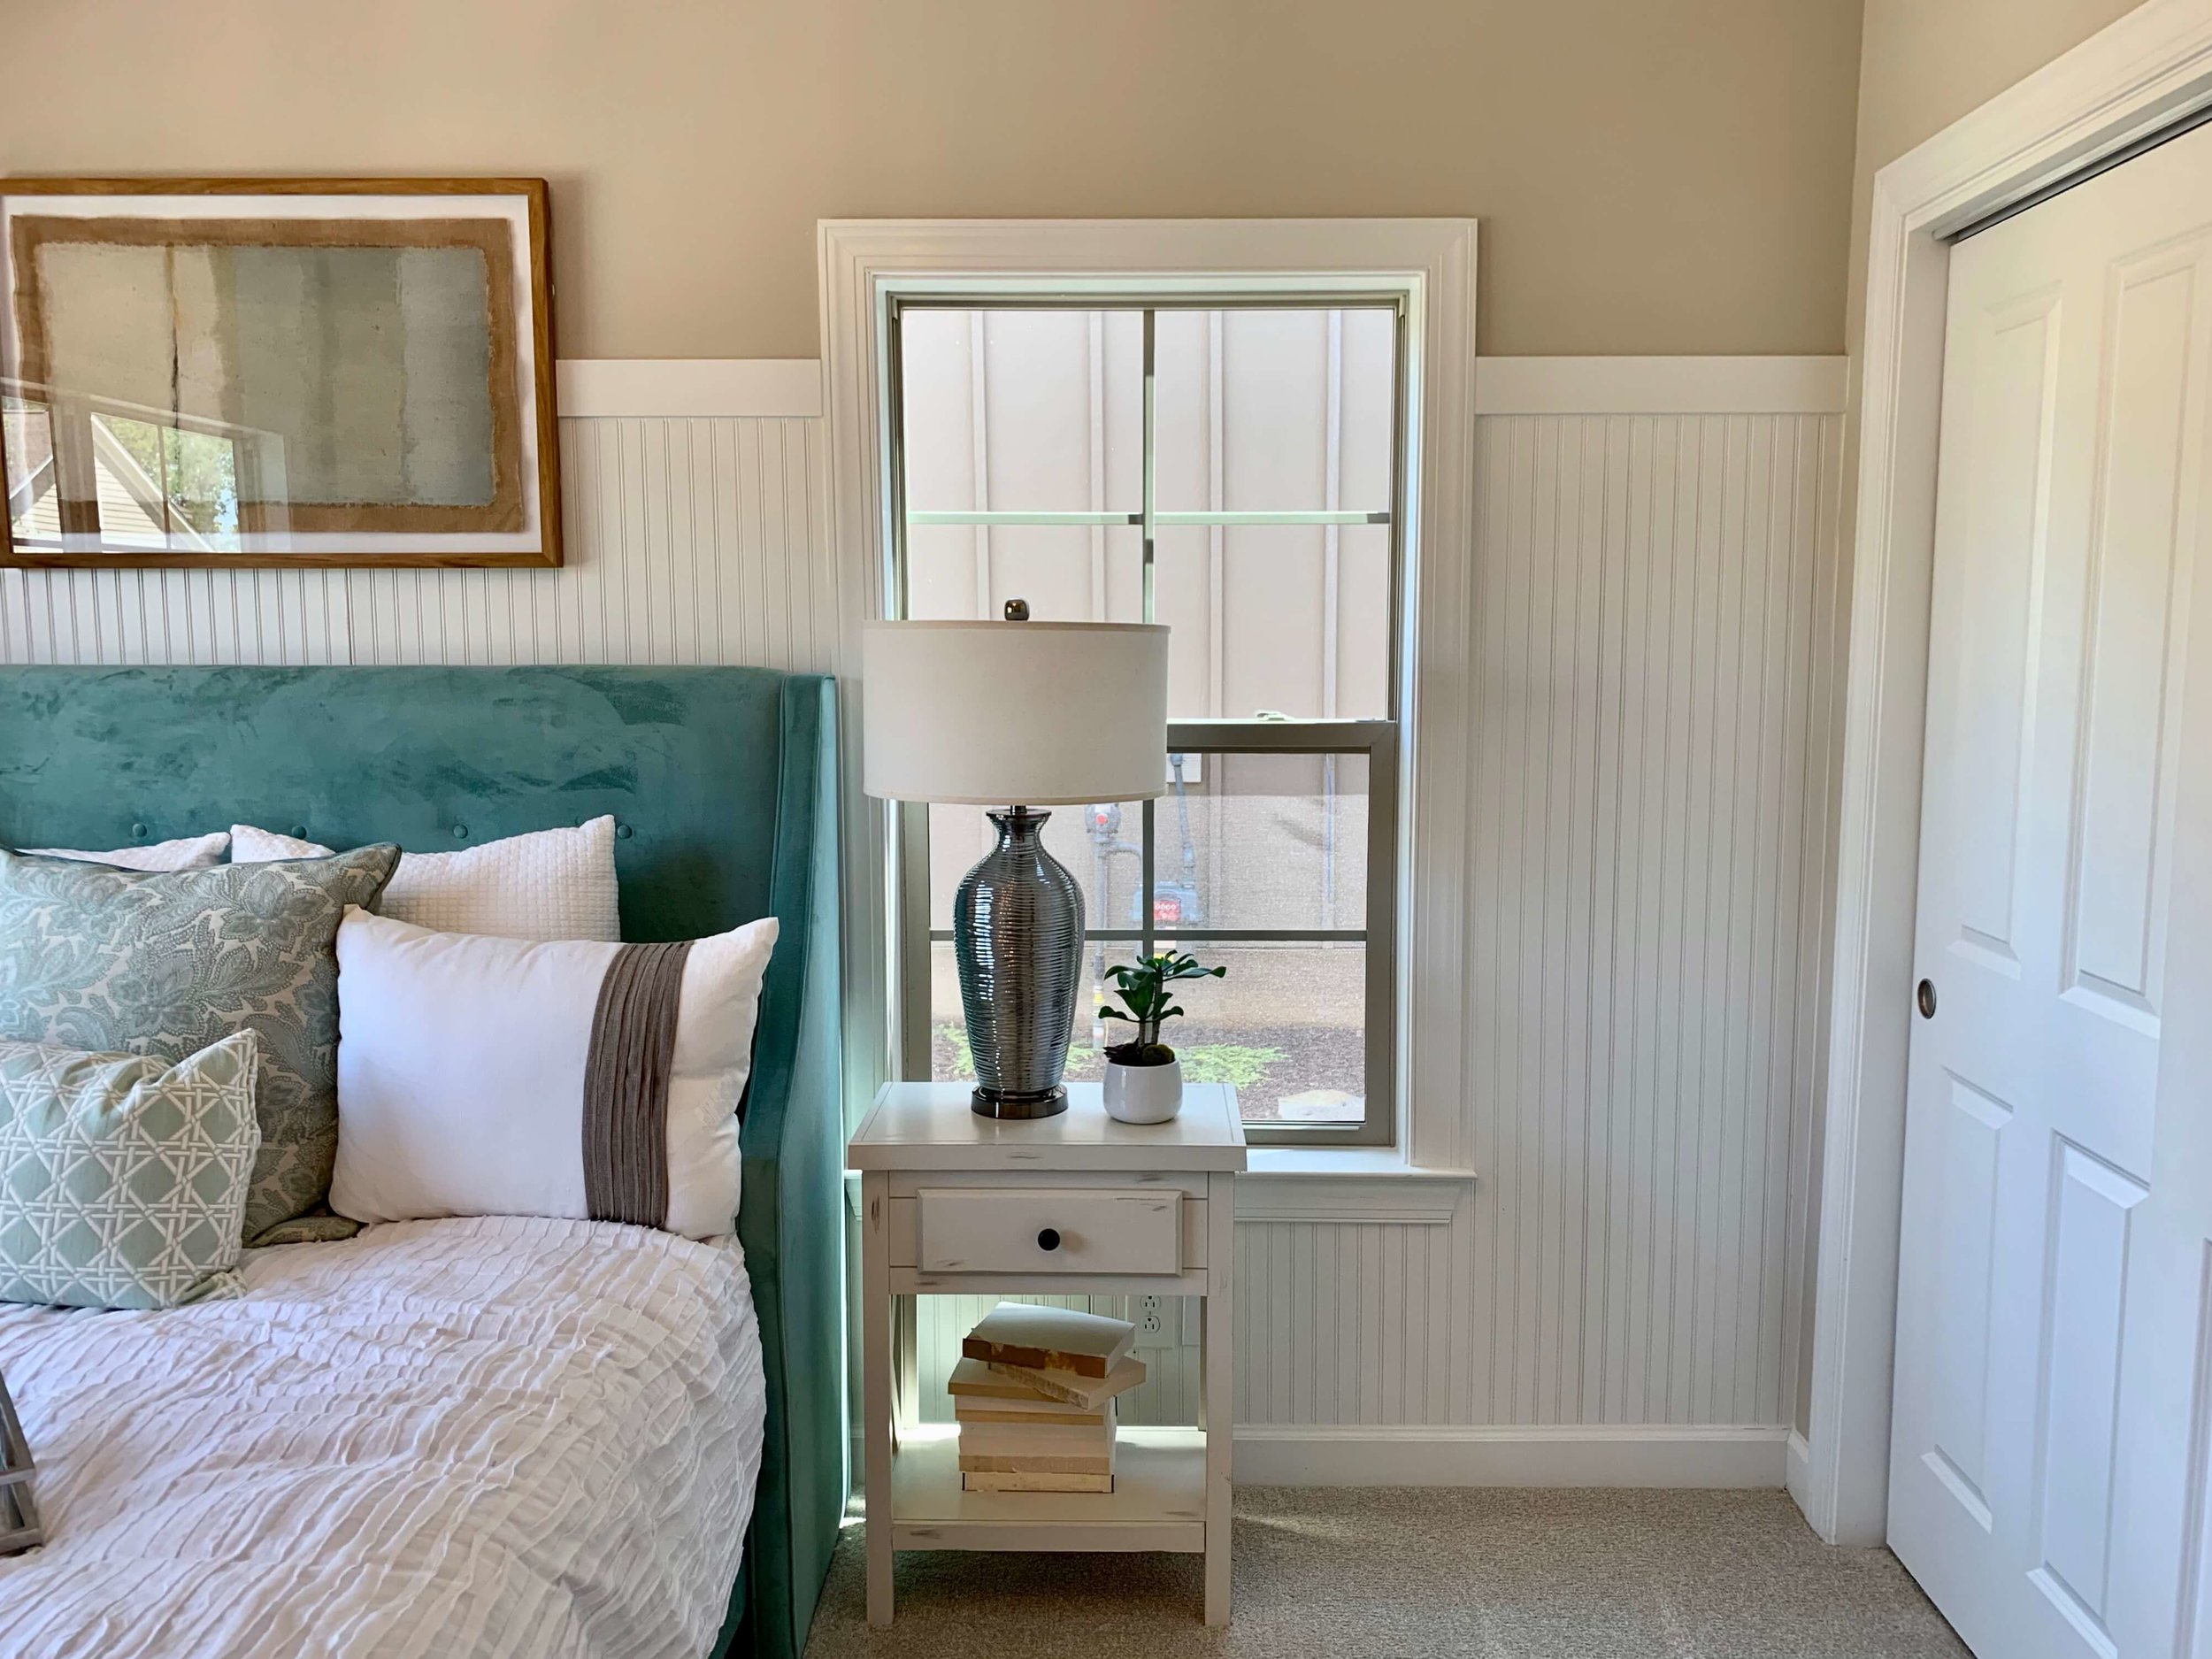 decorating_ideas_beadboard_guest_room.jpeg